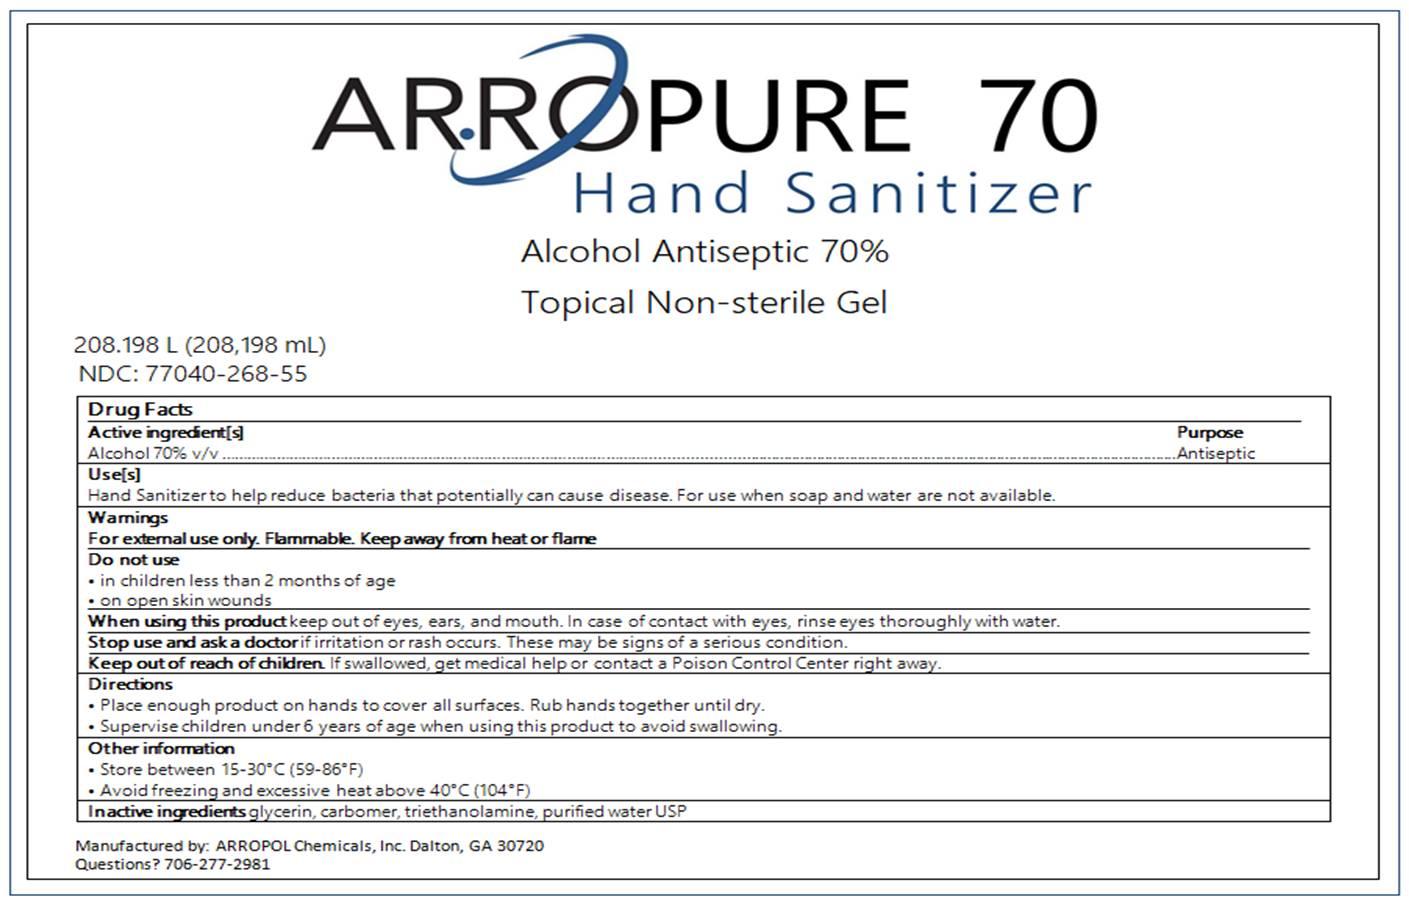 208198 ml label